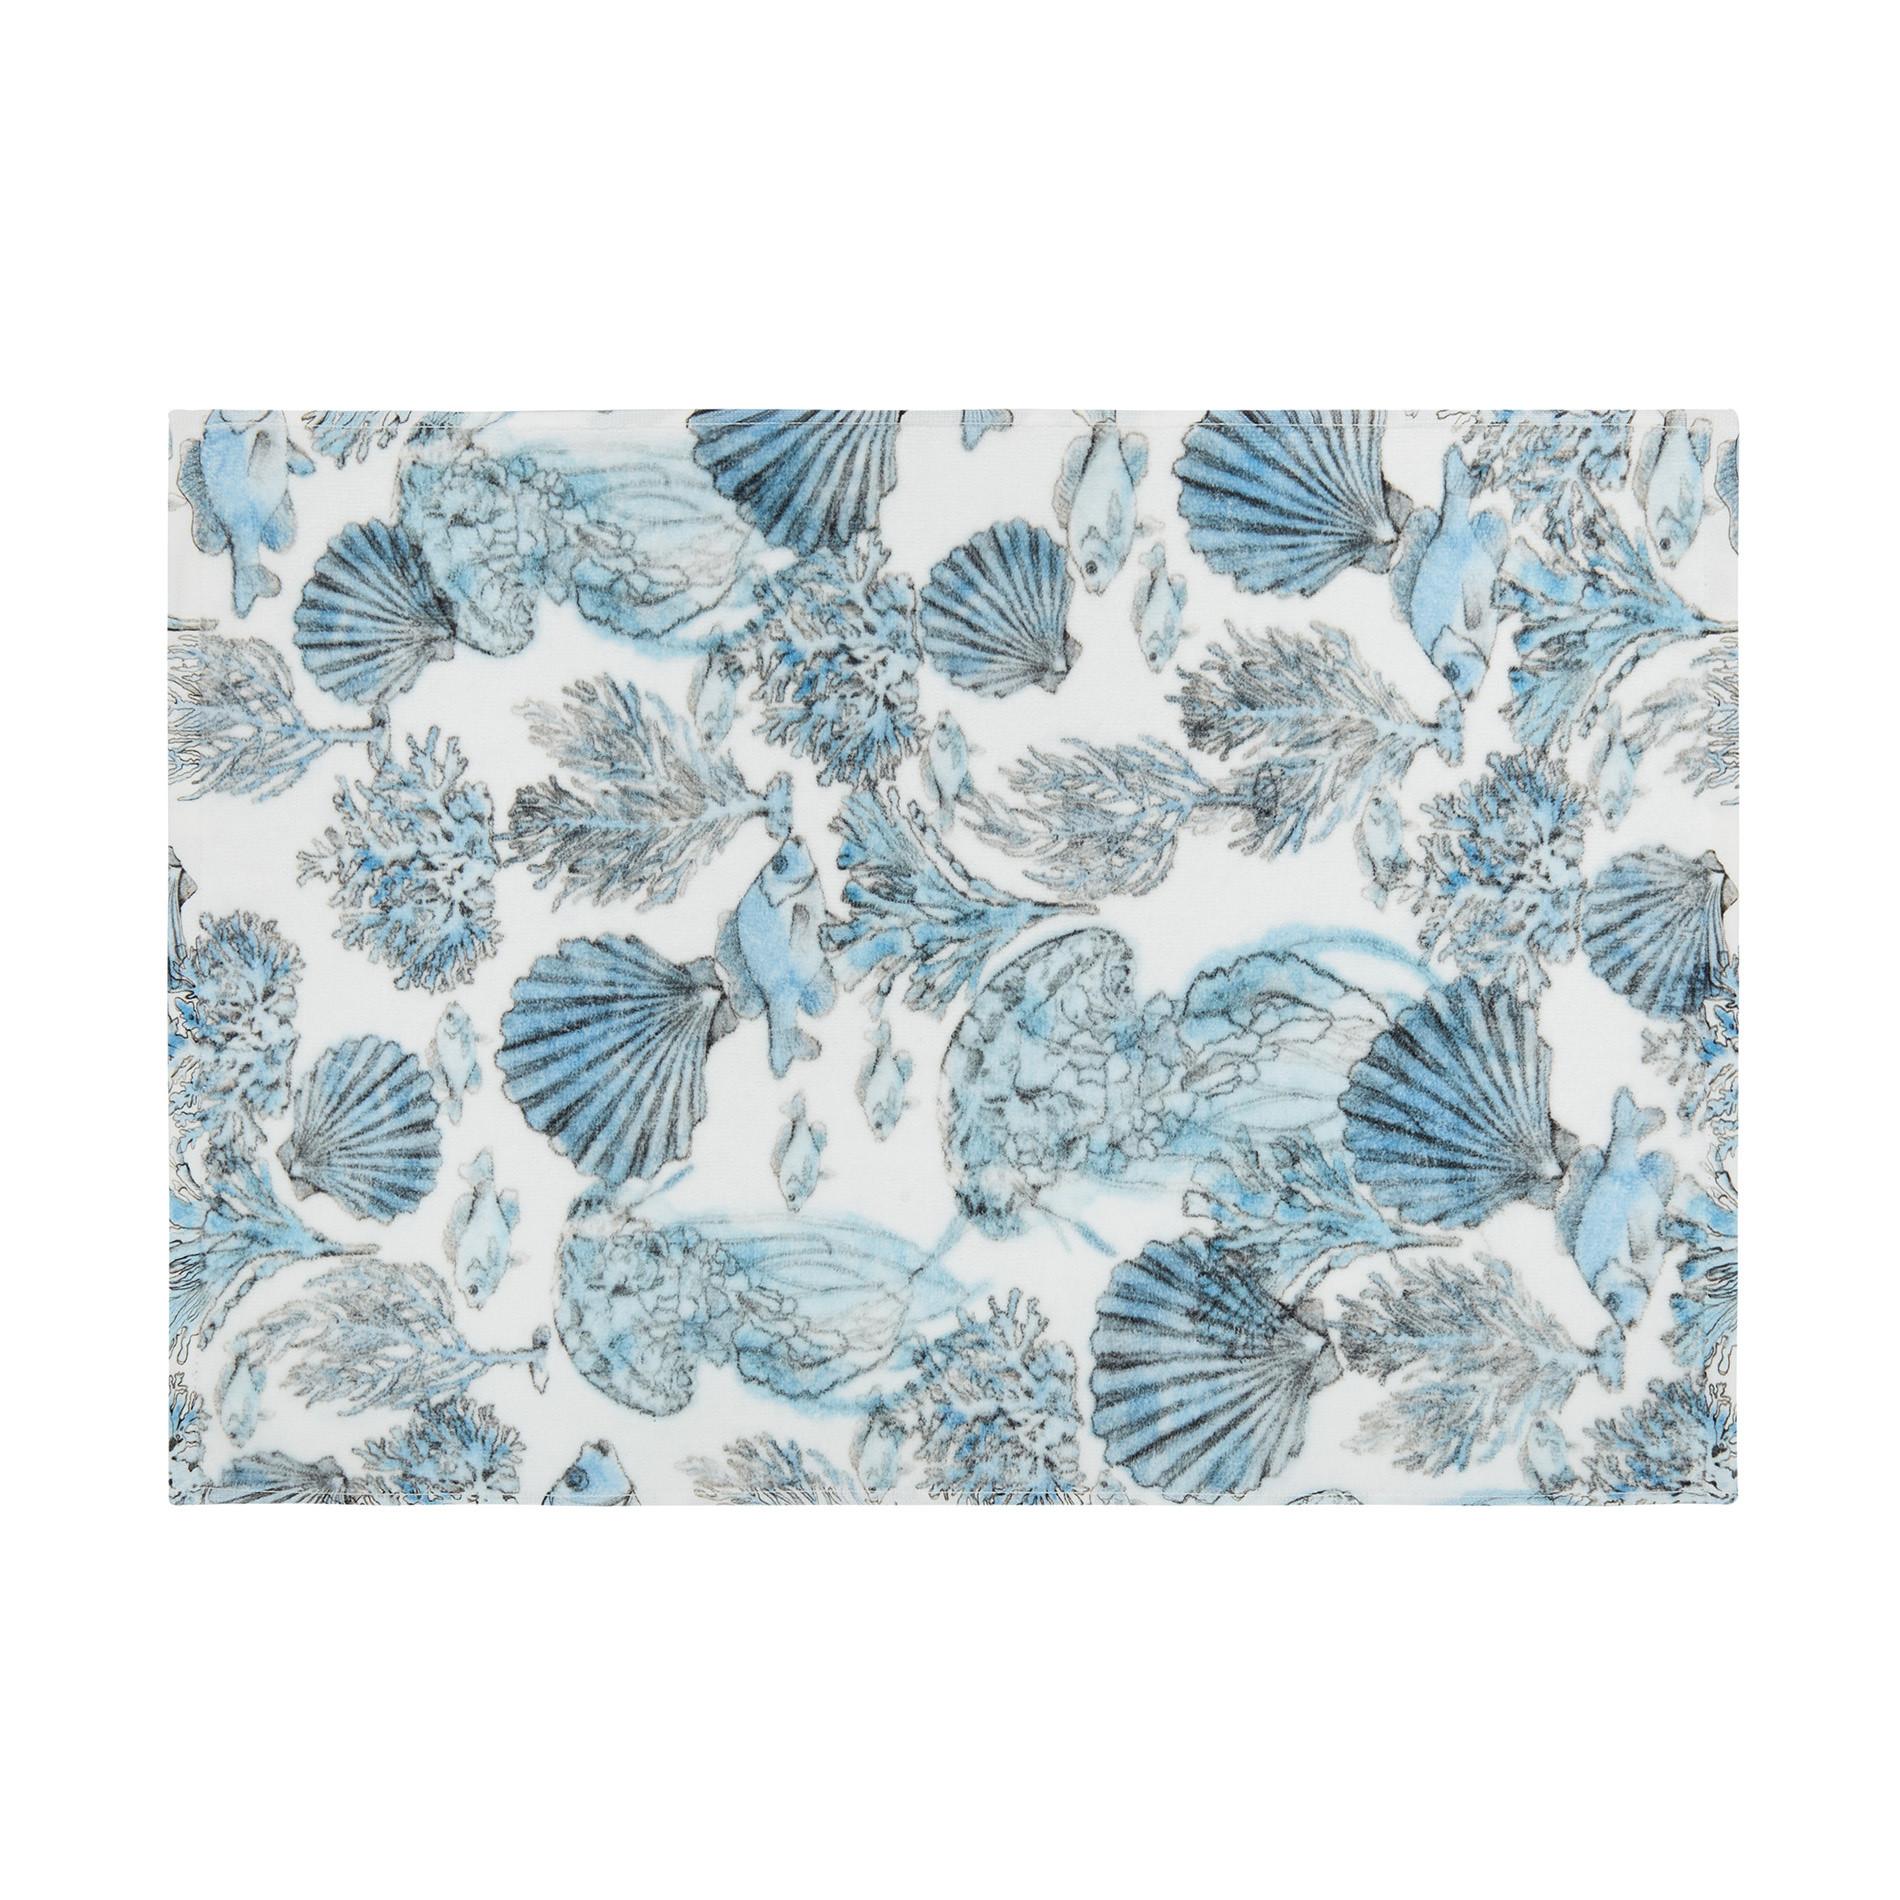 Asciugamano cotone velour stampa fondale marino, Bianco, large image number 1